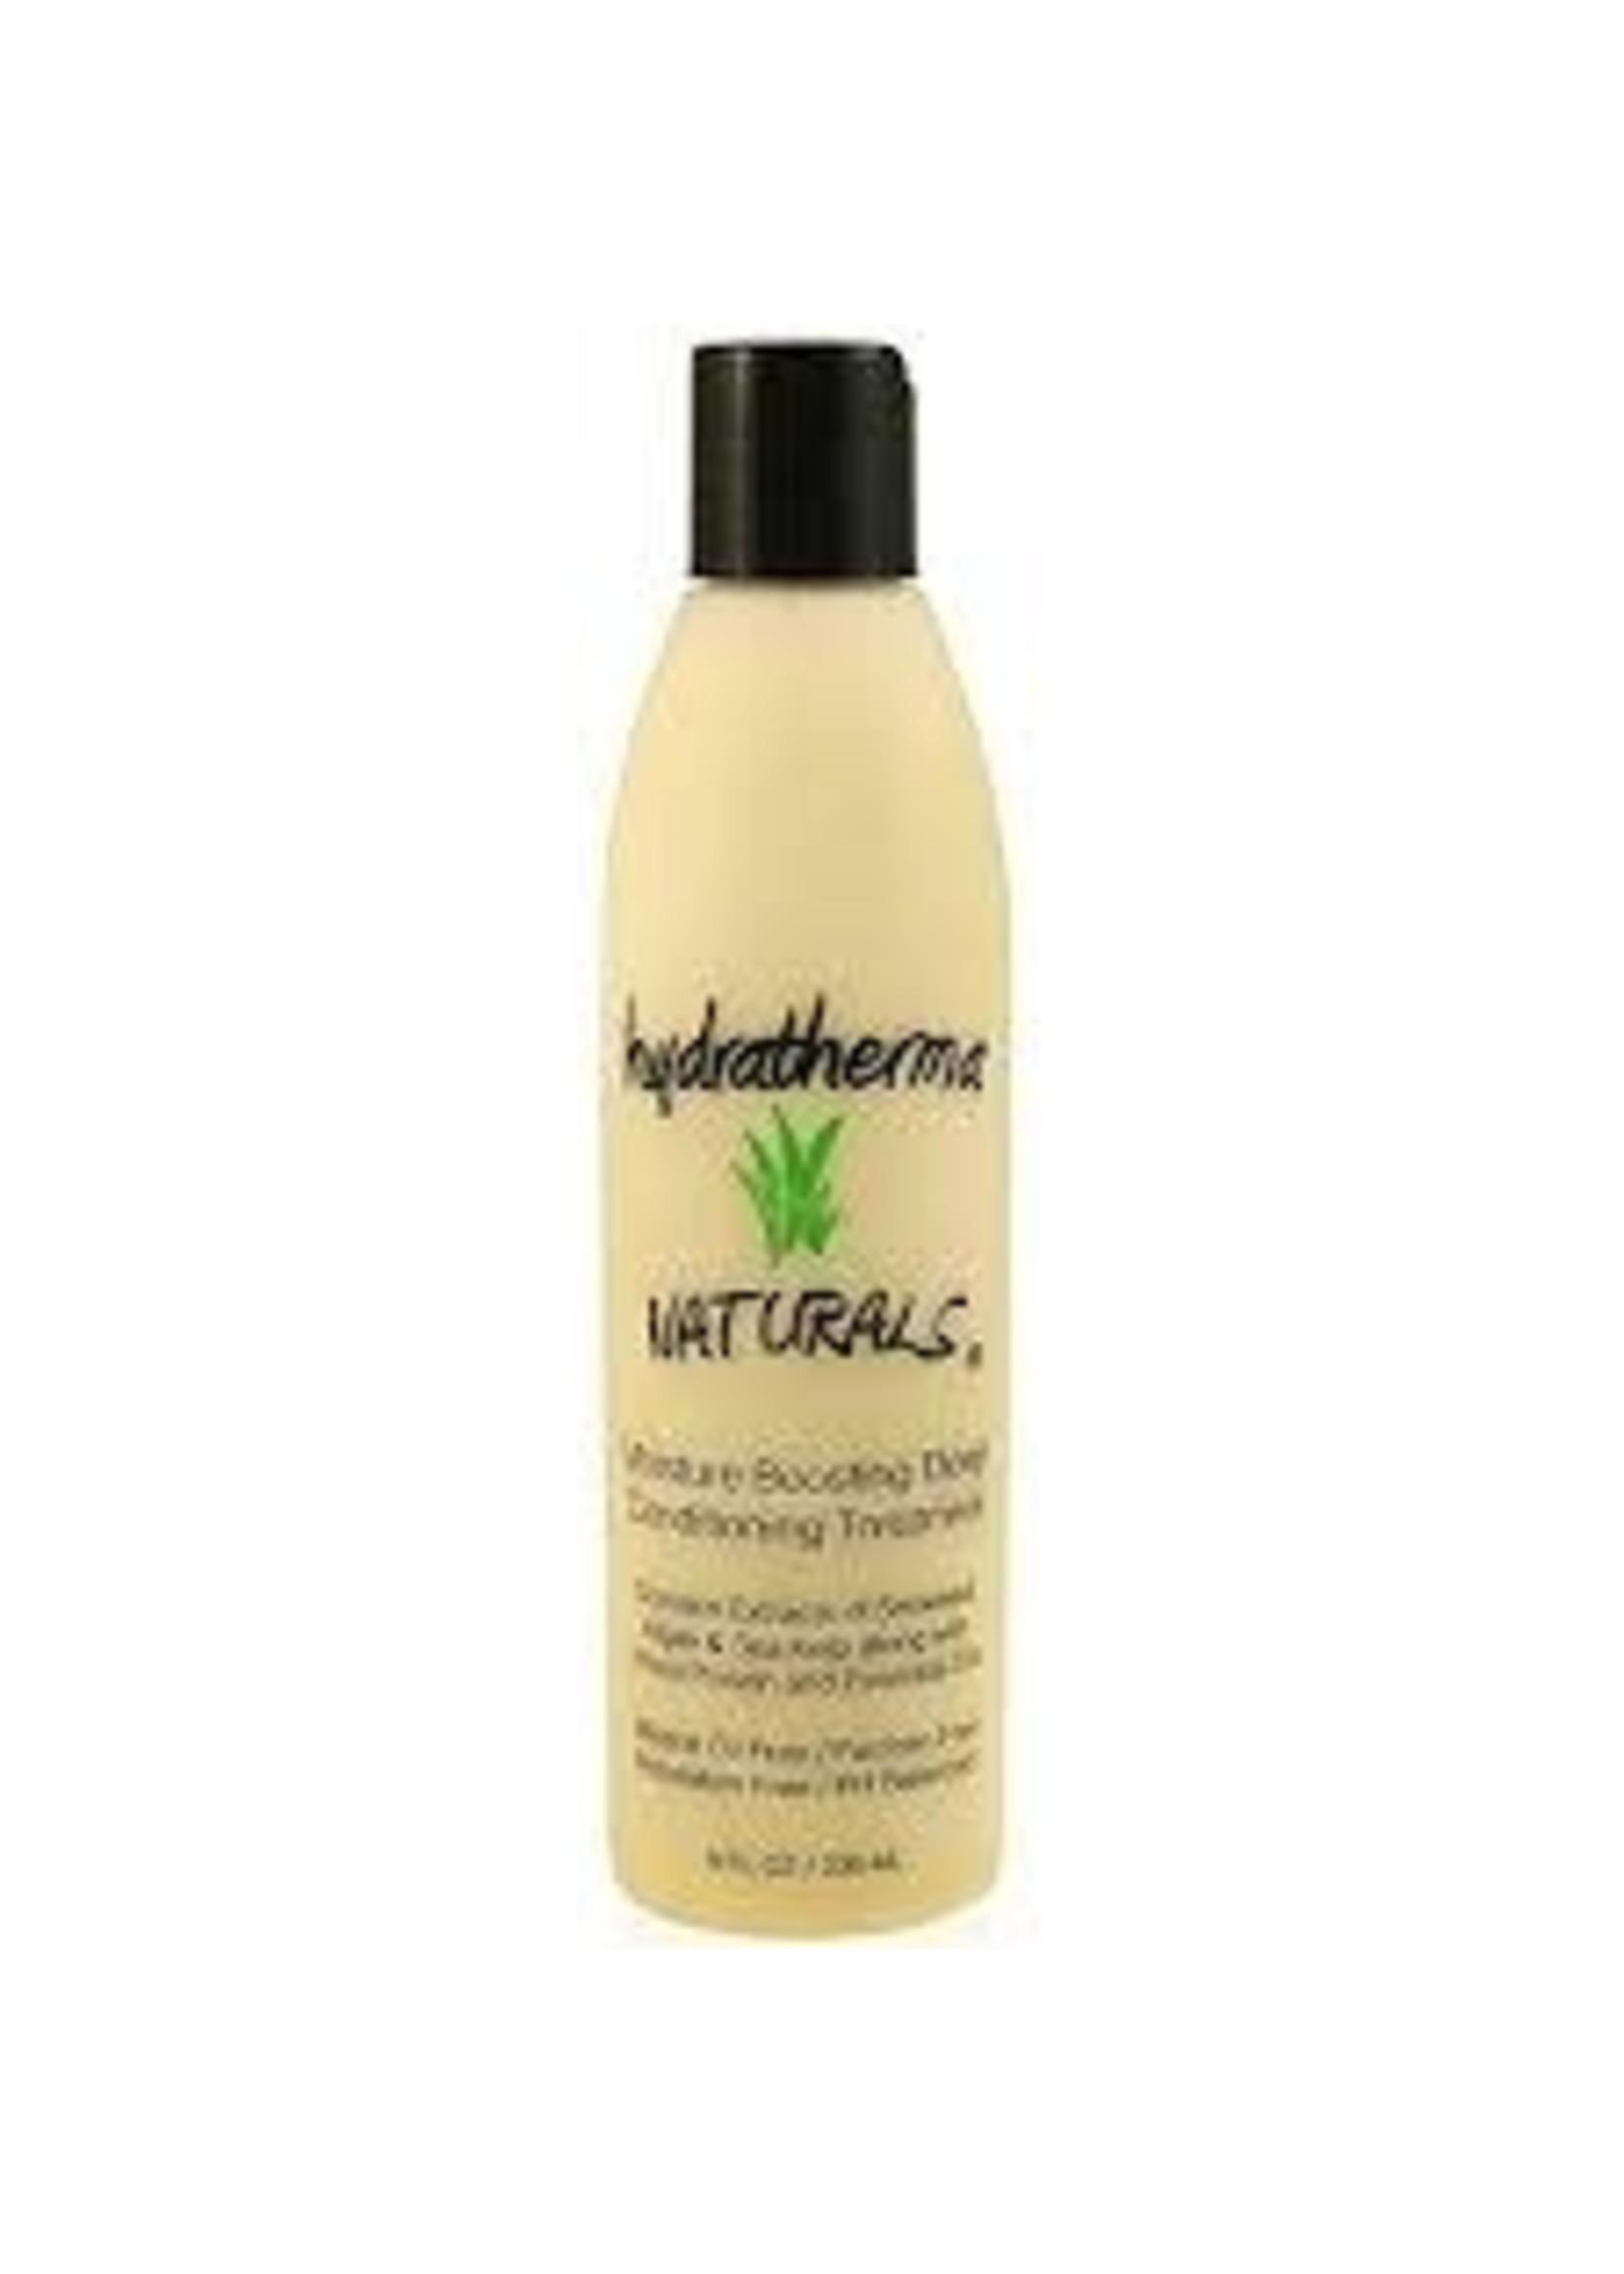 Hydratherma Naturals Moisture Boosting Deep Conditioner 8oz